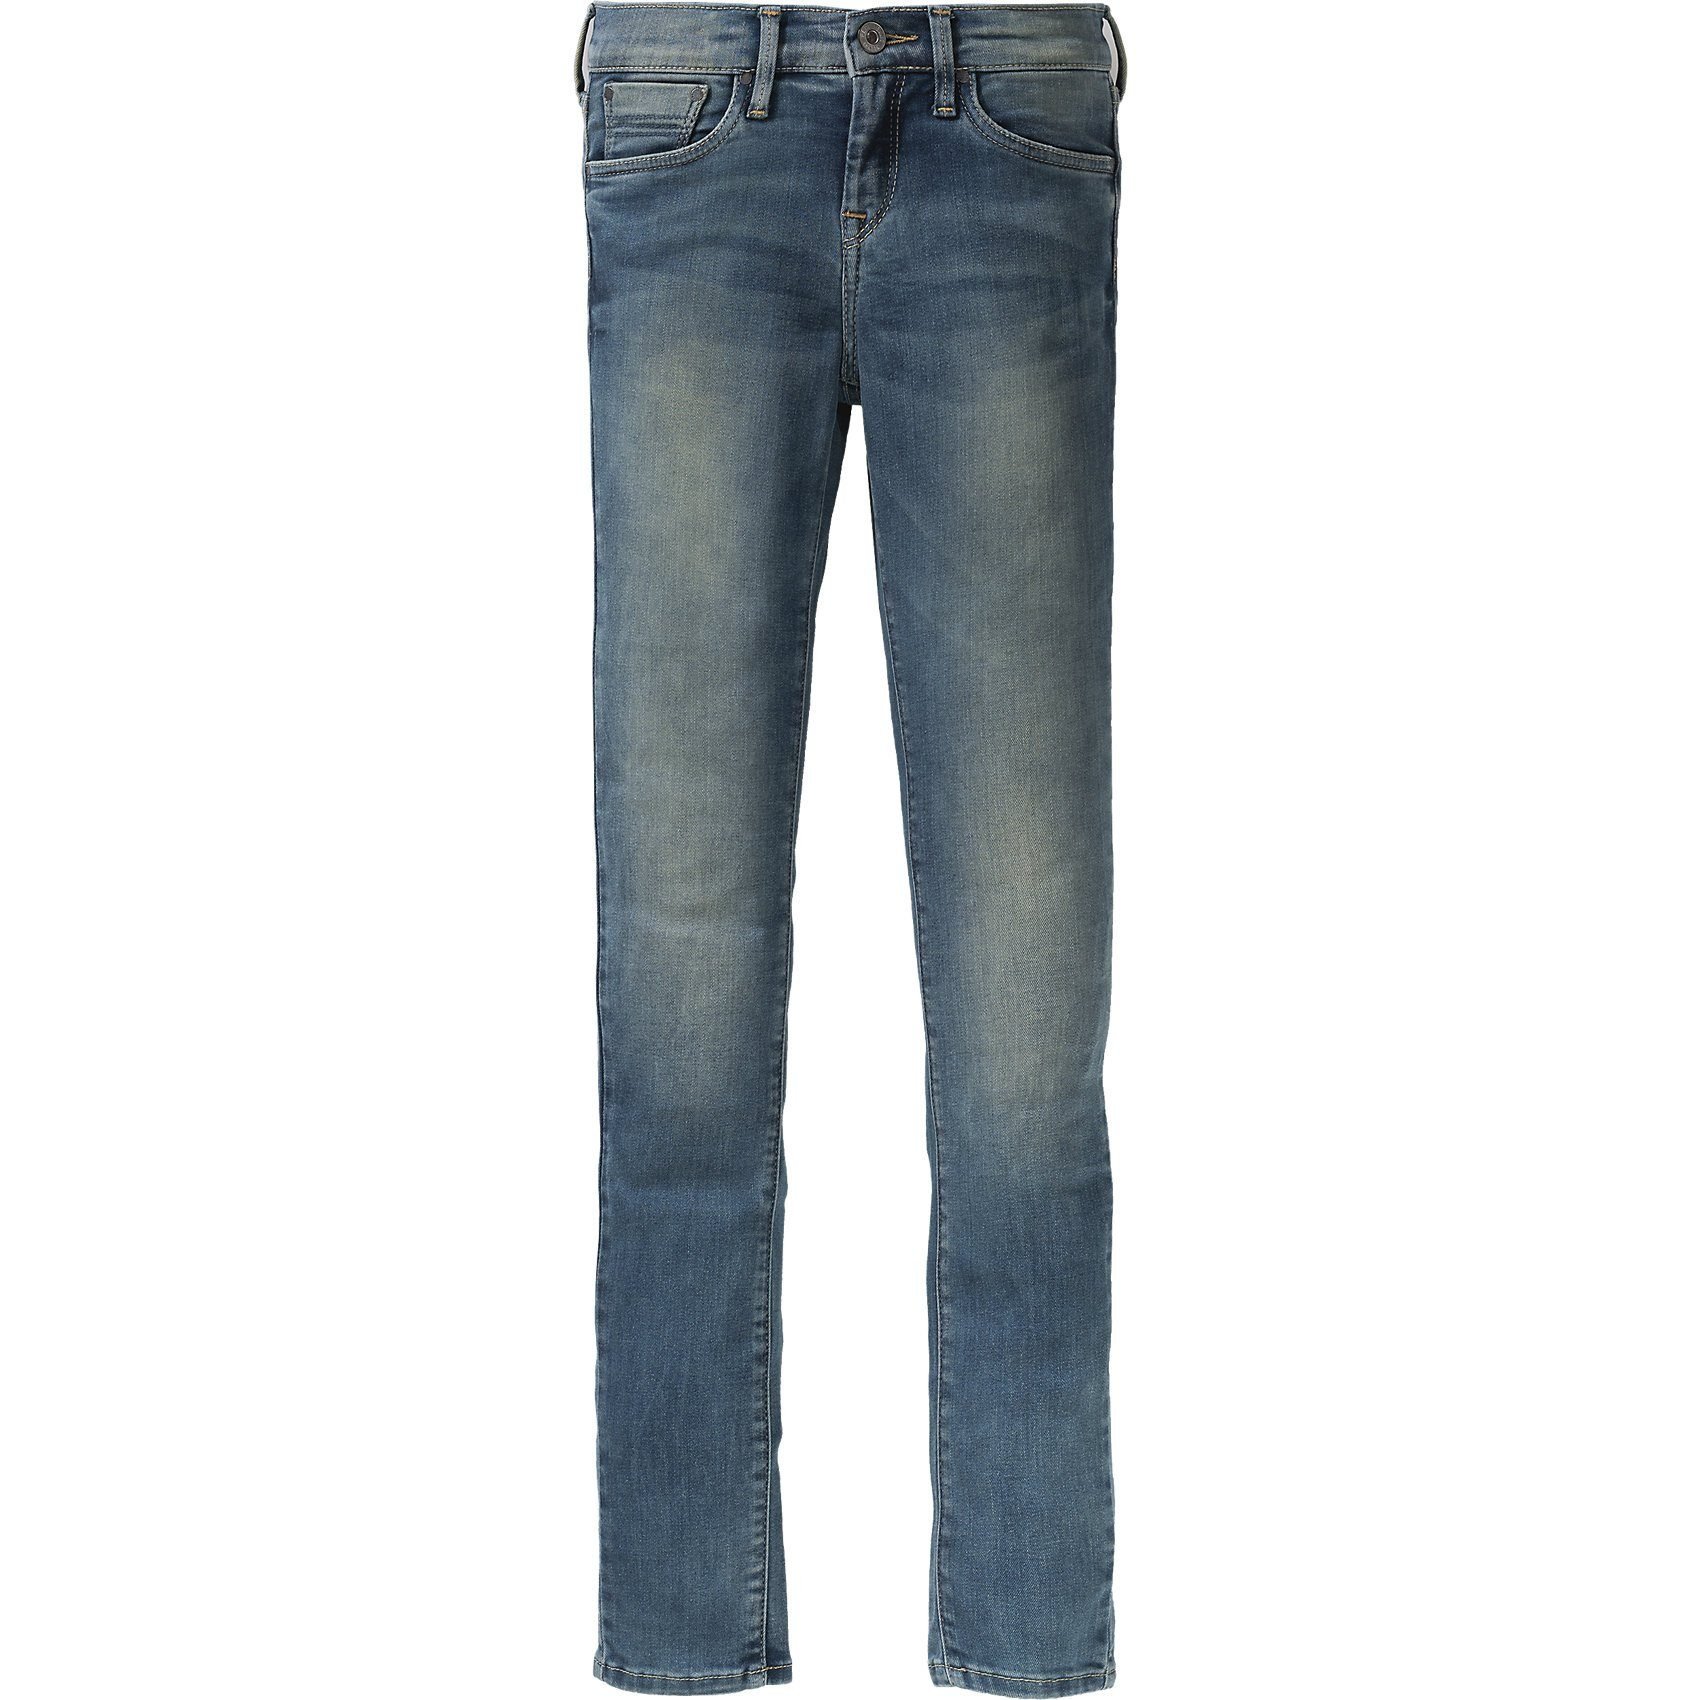 Damen,  Mädchen,  Kinder Pepe Jeans Jeans PIXLETTE Skinny Fit für Mädchen blau, grau, rosa | 08434030393368